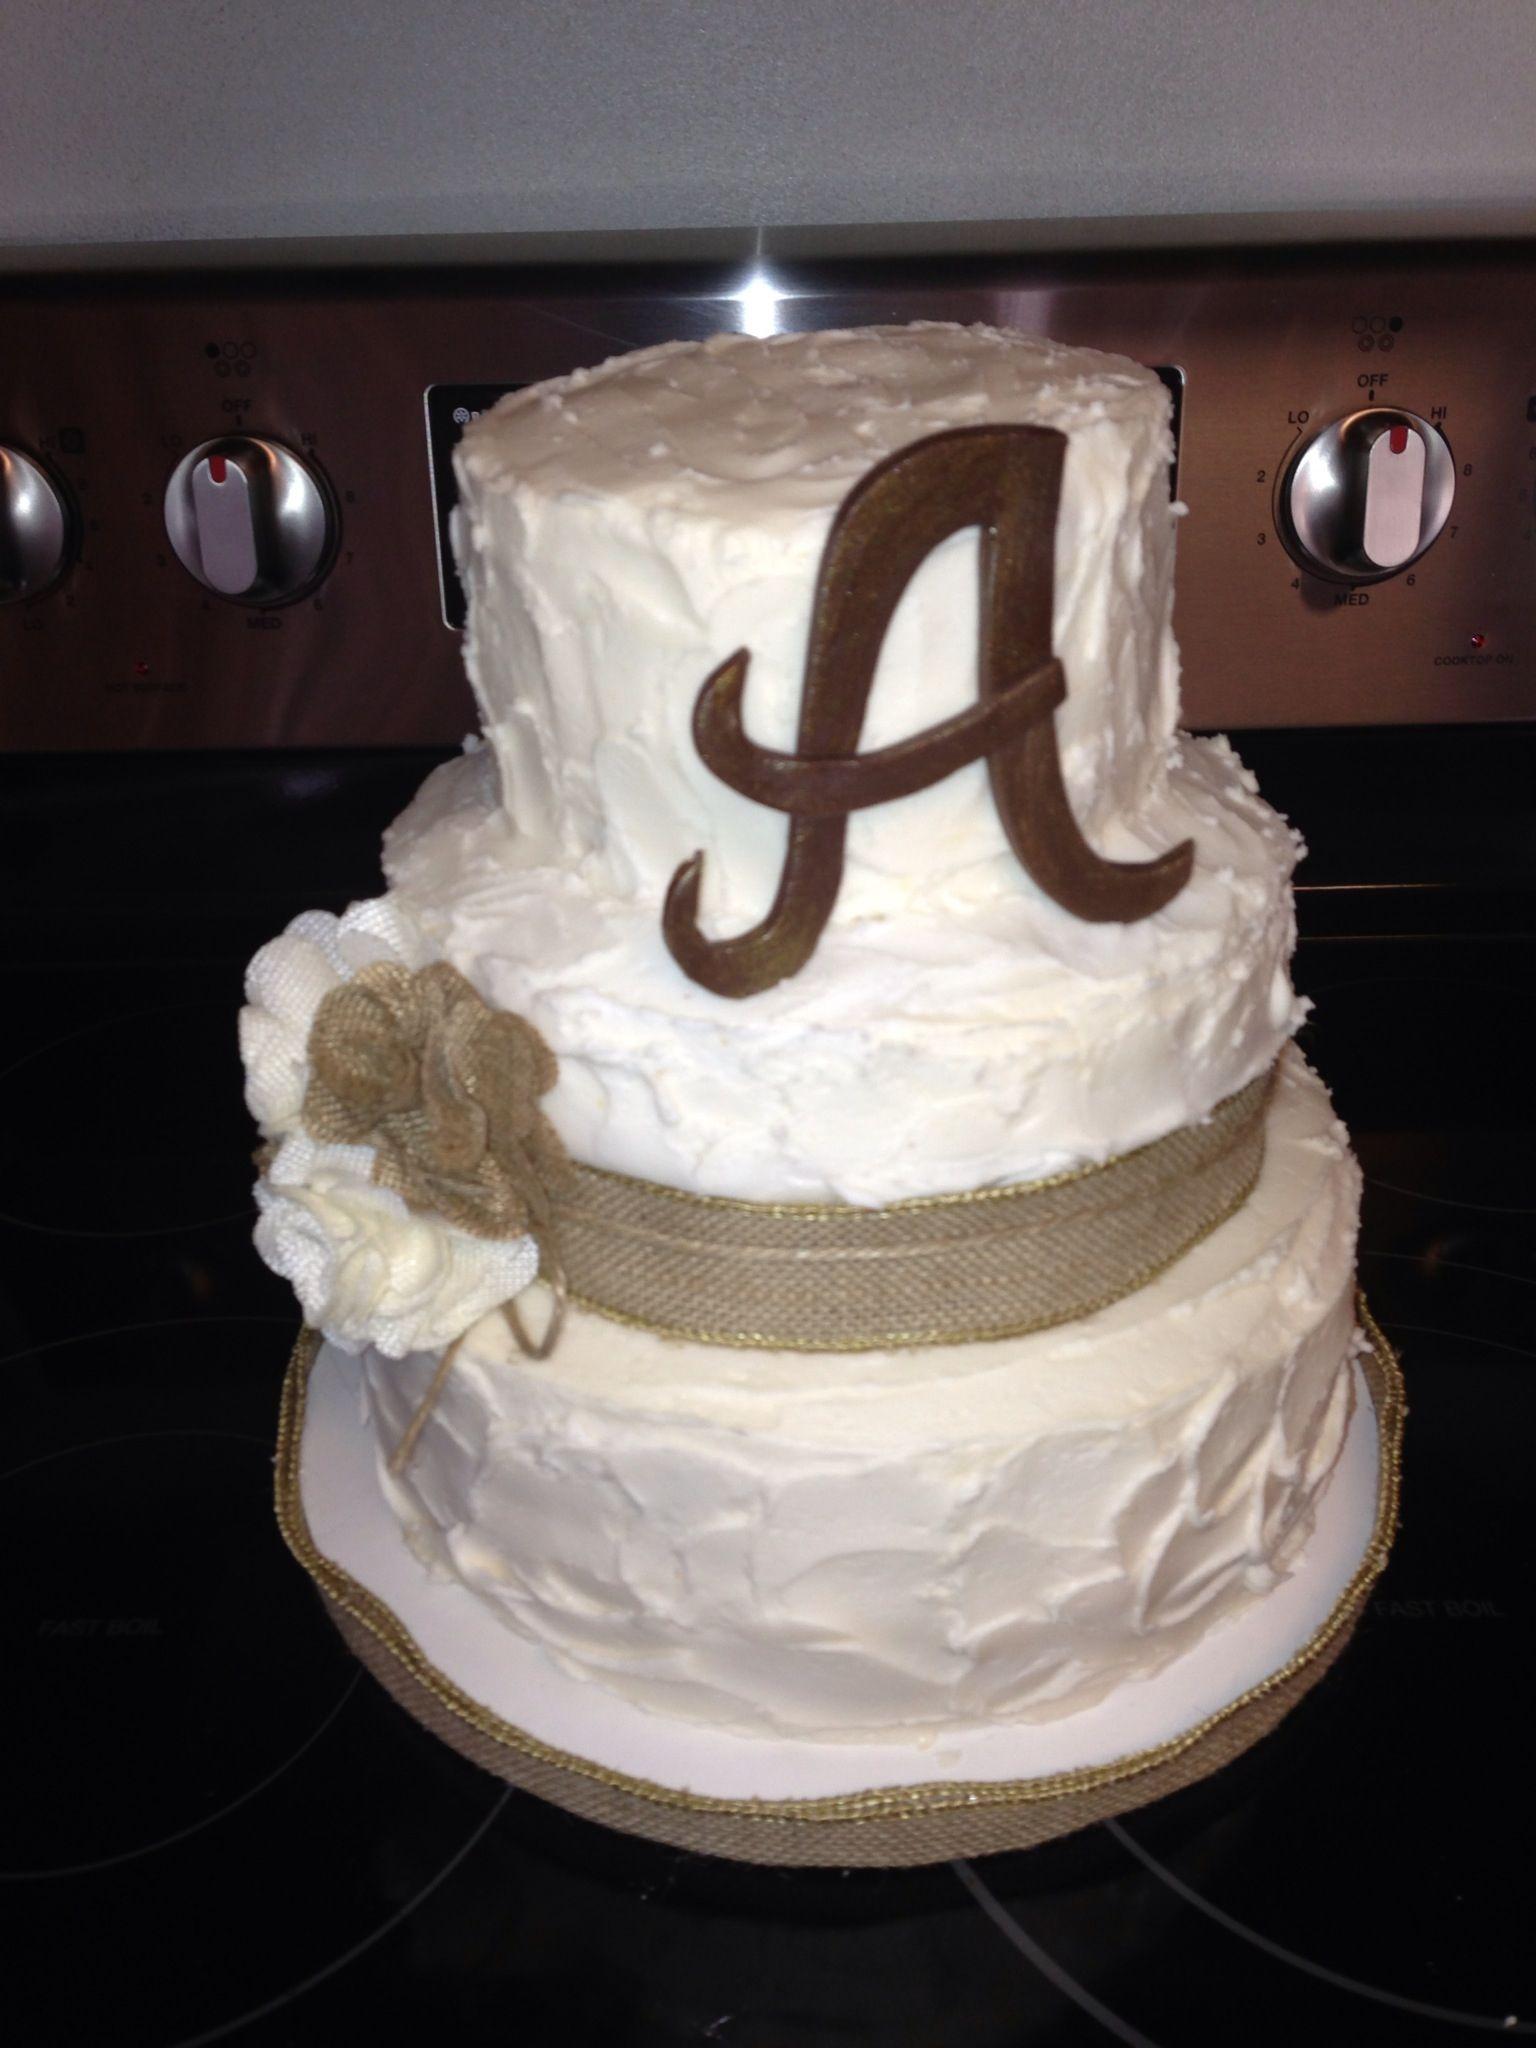 Wedding shower burlap cake cakes pinterest burlap for Cakes for wedding showers